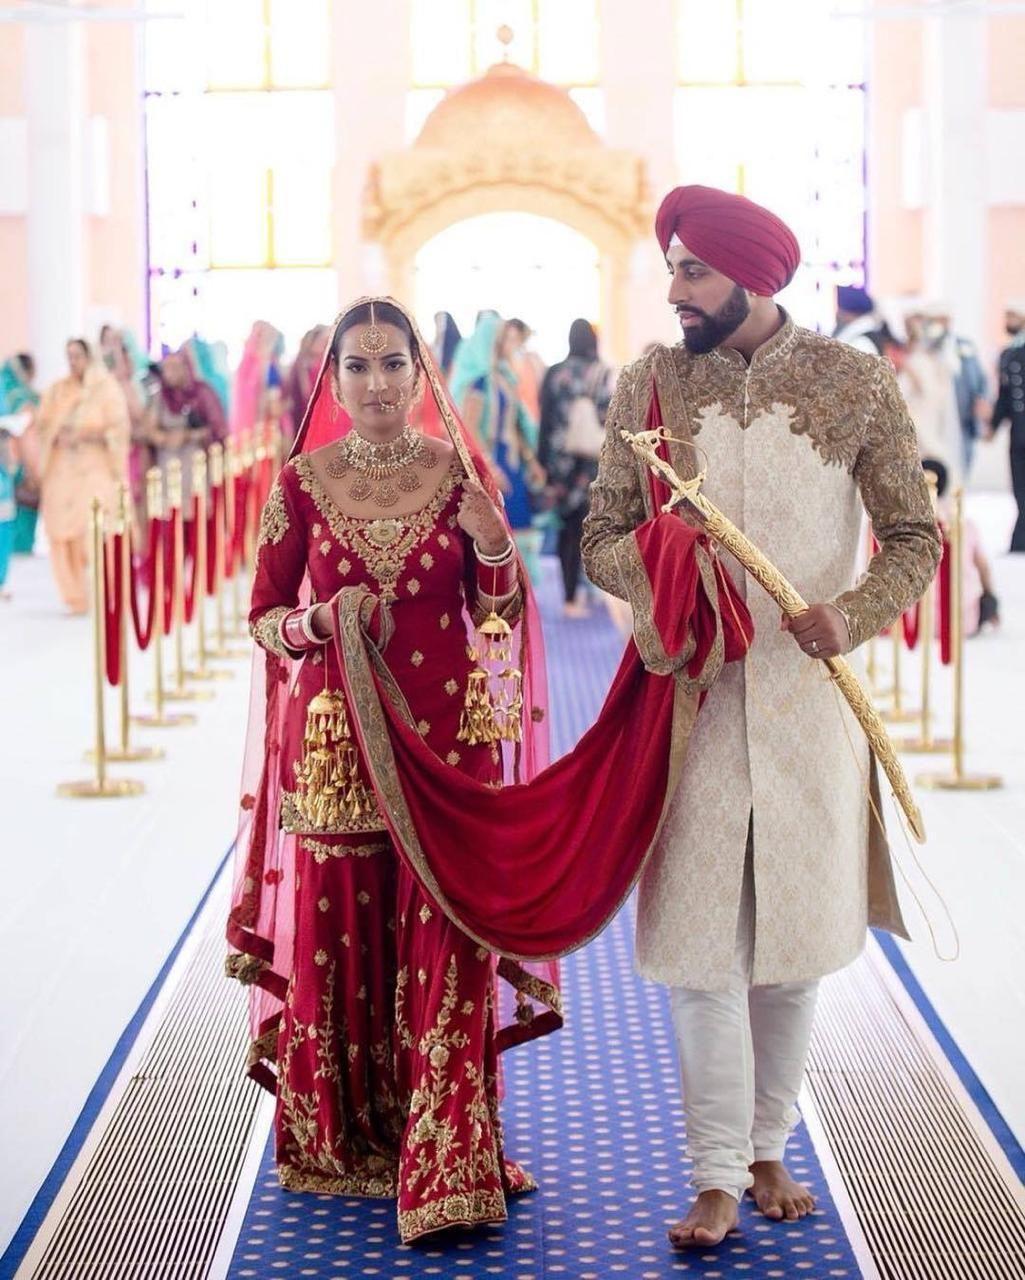 Elegant Traditional Bride And Groom Complete Punjabi Wedding Wear B1949 Large In 2020 Indian Bridal Wear Bridal Suits Punjabi Indian Wedding Outfits